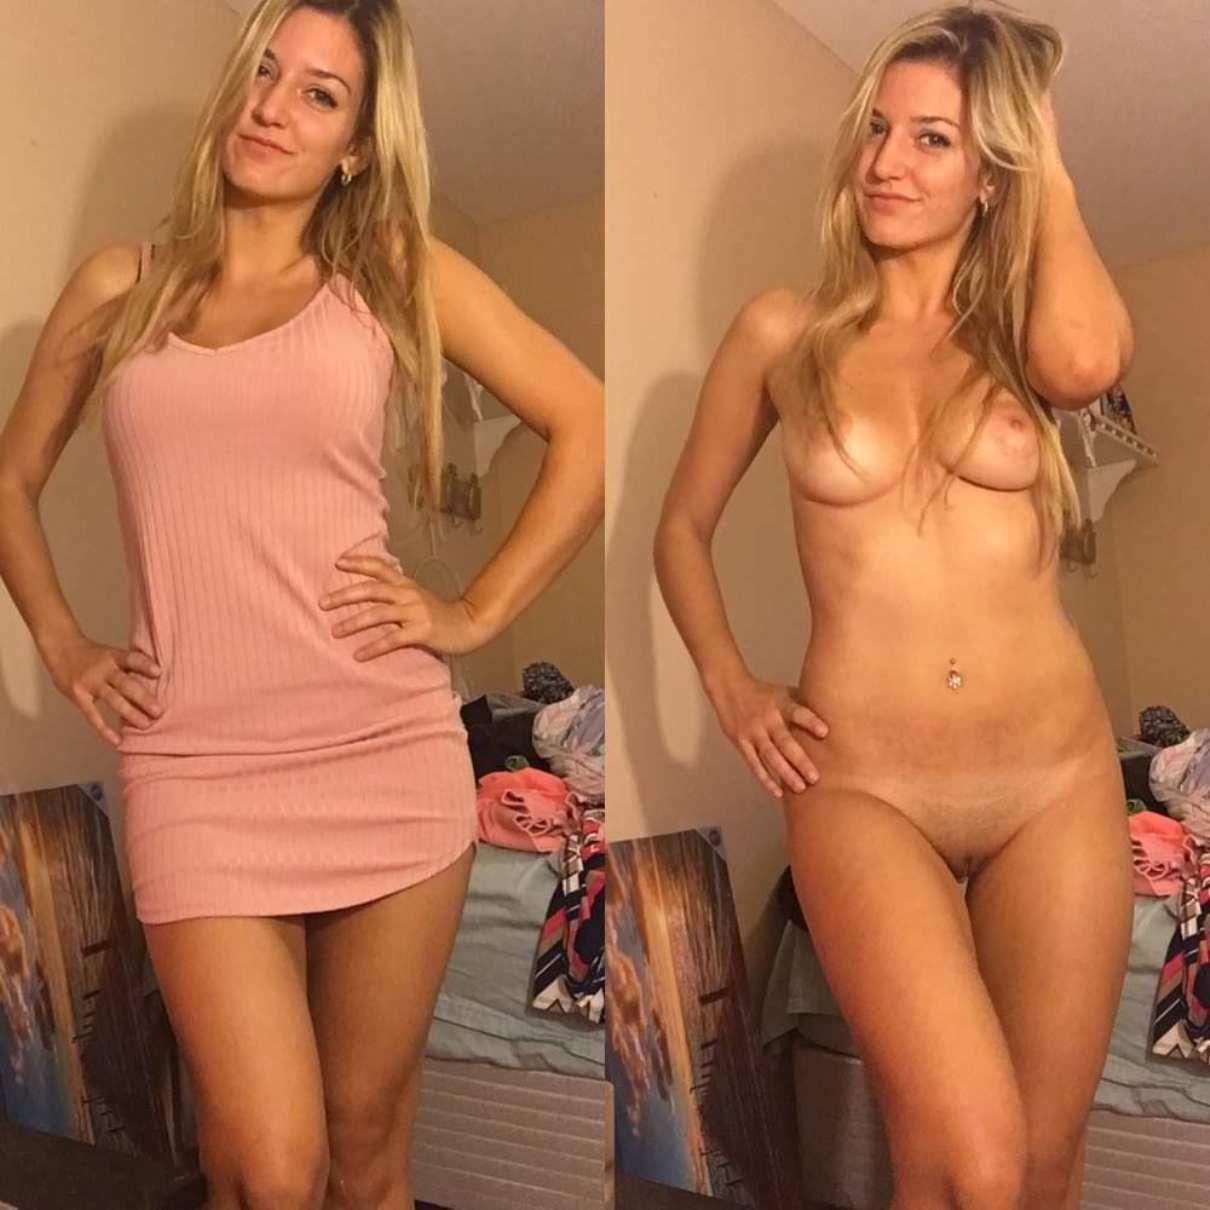 Actress Porn Amateur Natural Tits sex images | beautiful amateur girl presents her natural